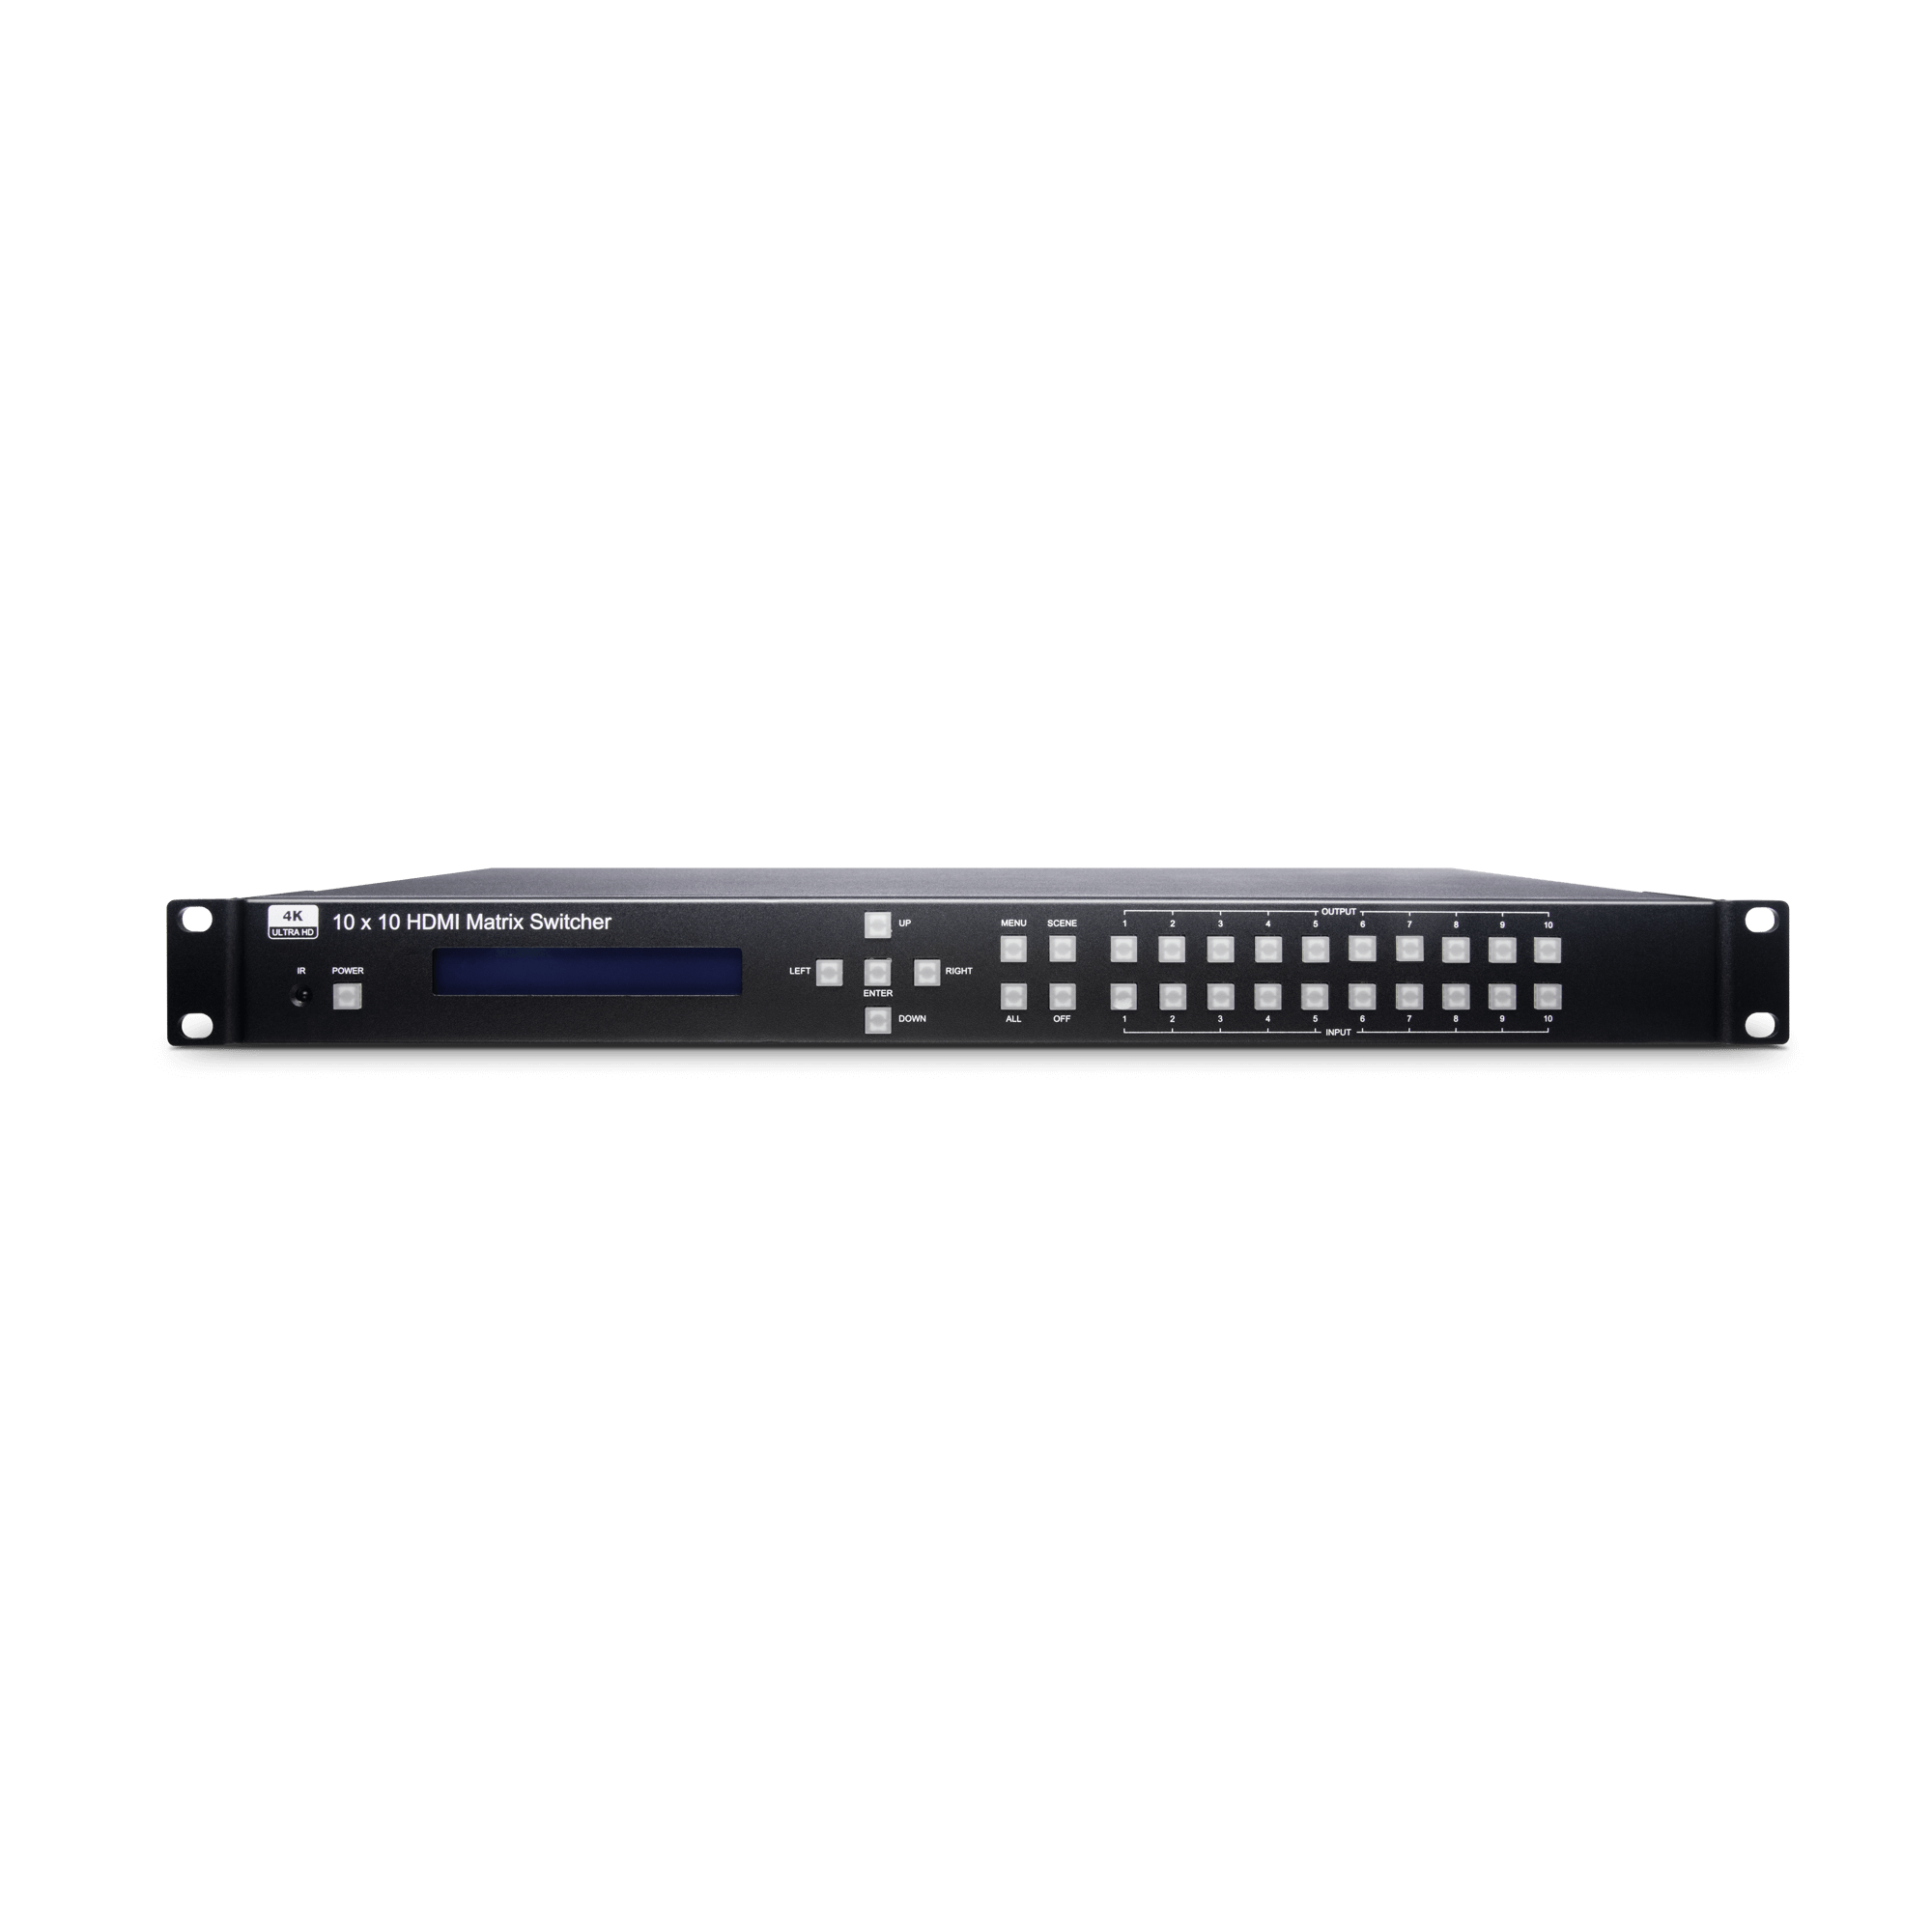 4K60Hz 10 x 10 HDMI Matrix Switcher Built in Audio Extractor